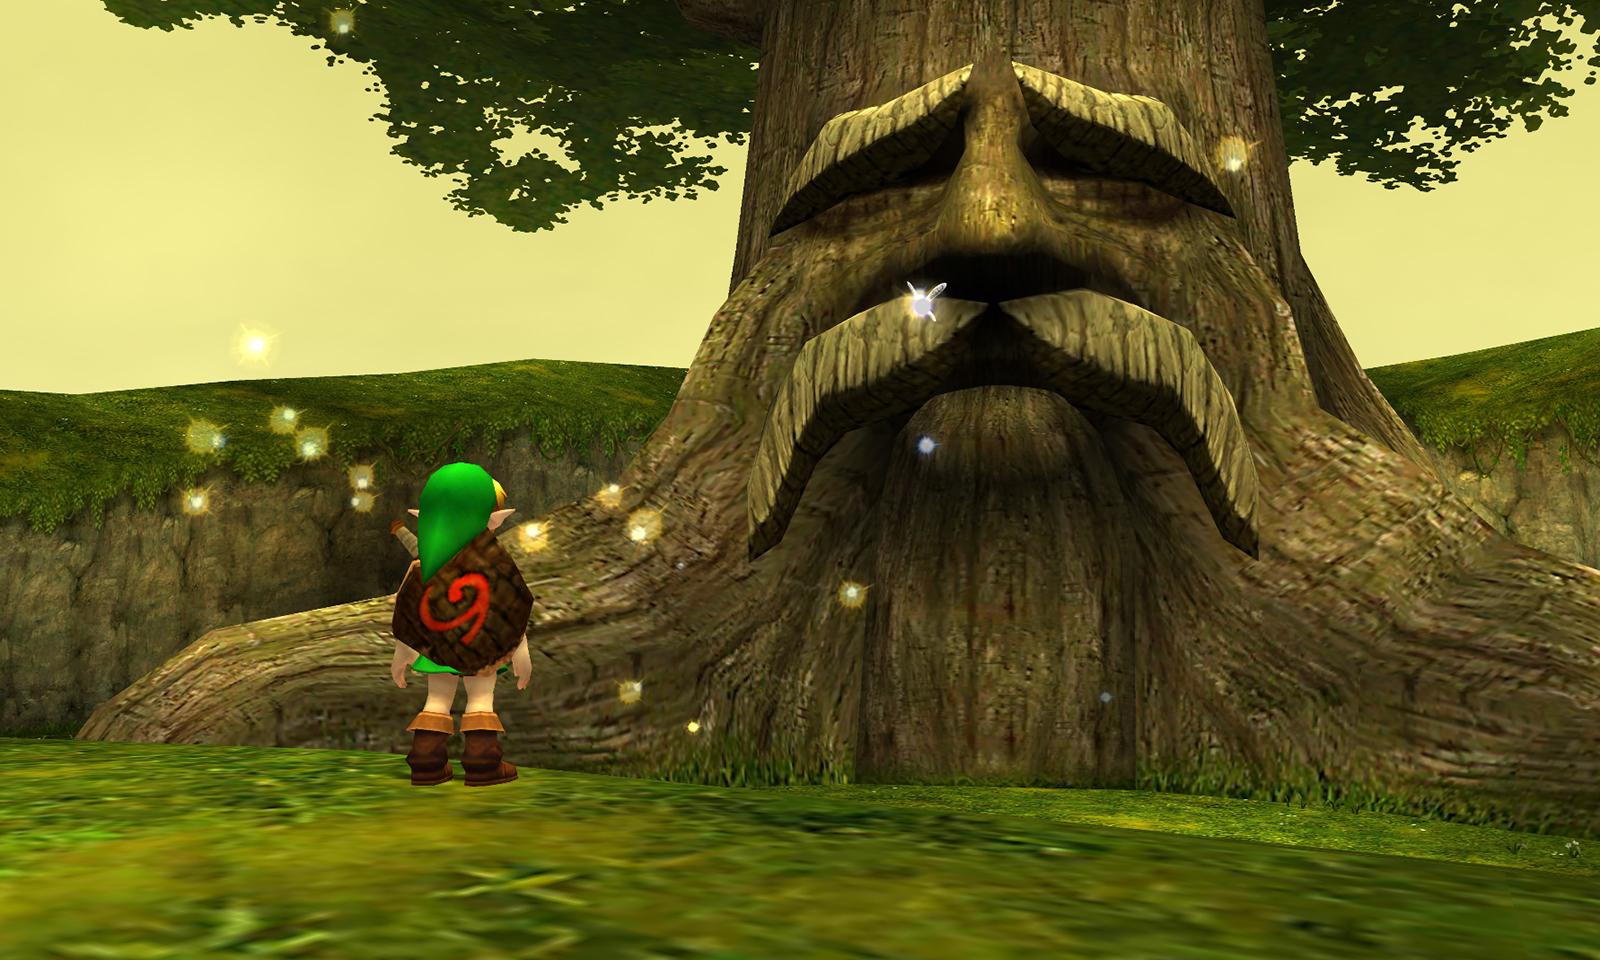 Citra - The Legend of Zelda Ocarina of Time 3D (high